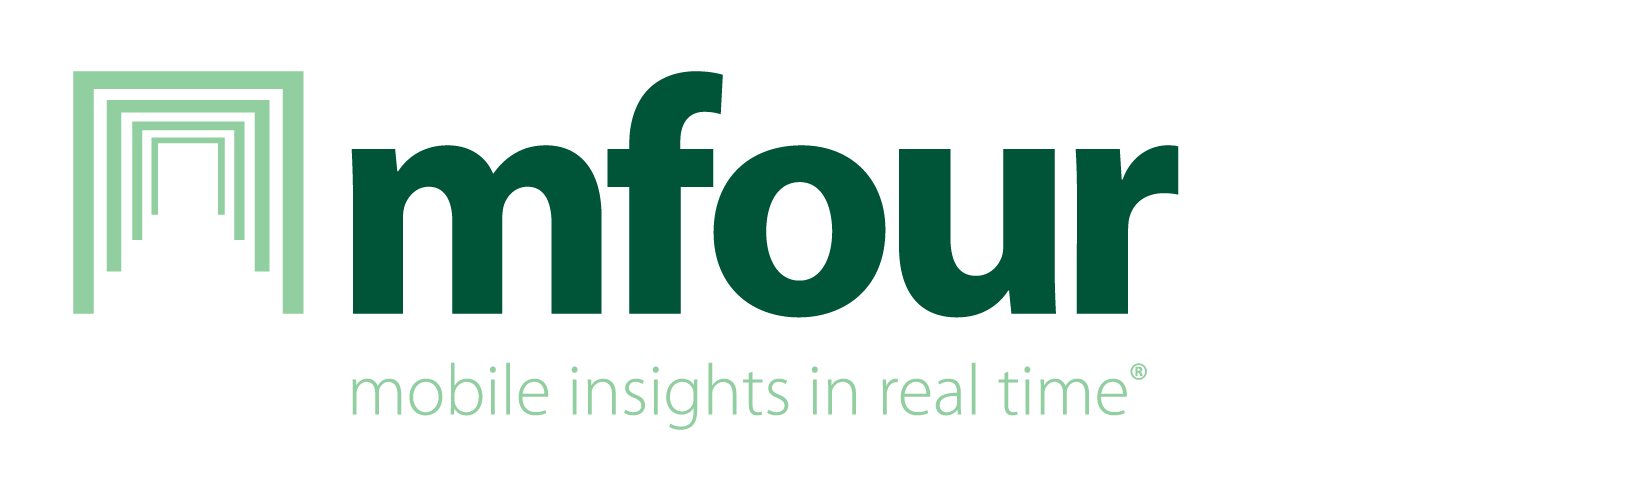 Mobile Market Research - MFour